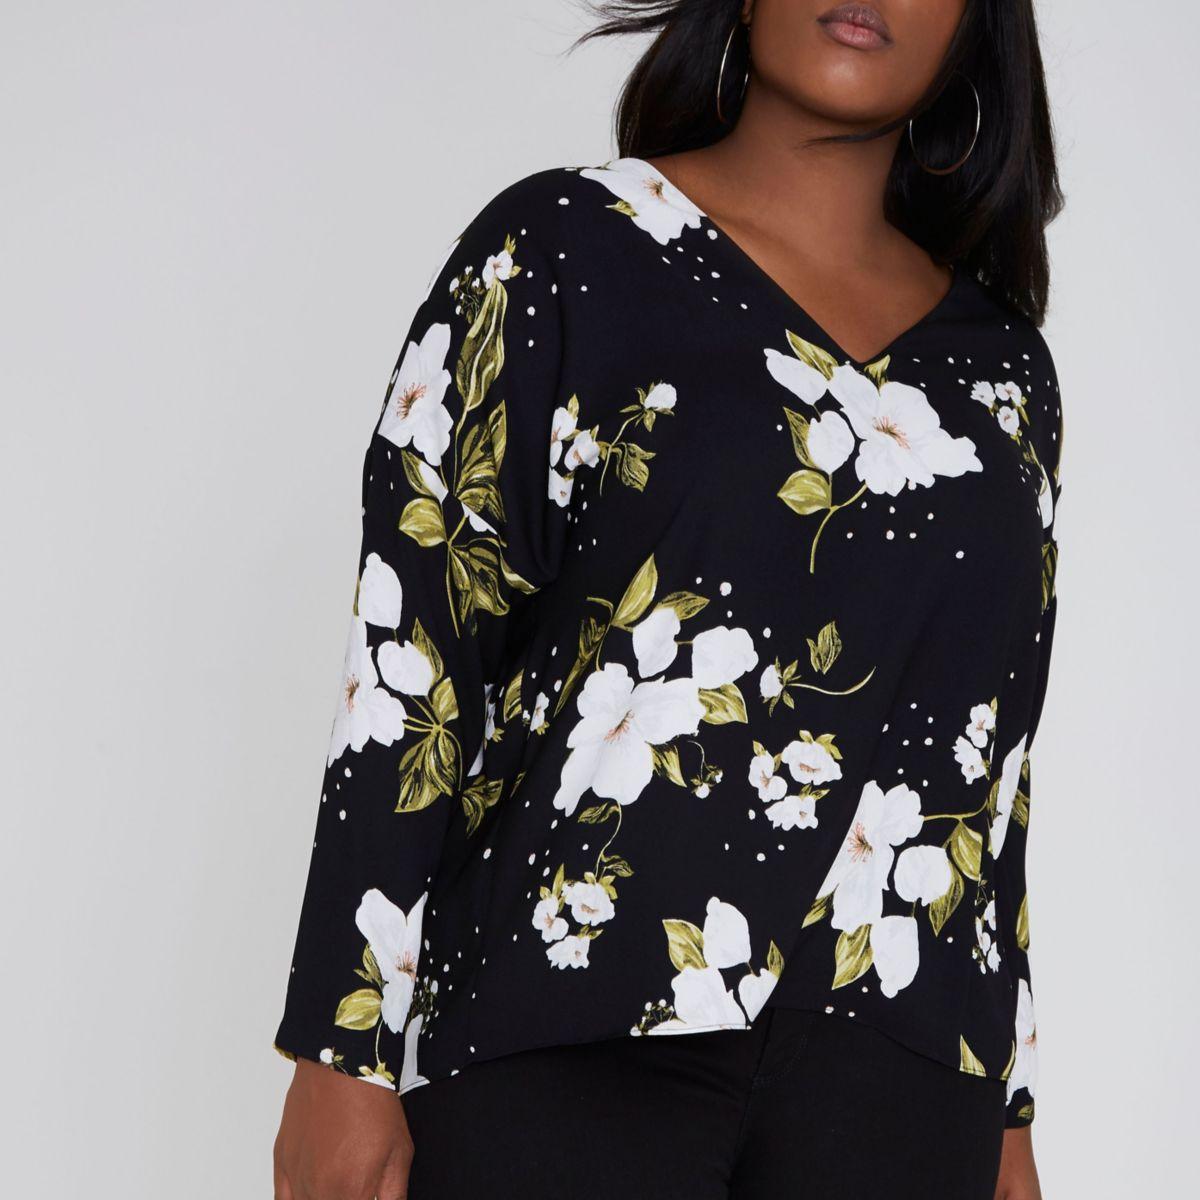 Plus black floral lace-up long sleeve top